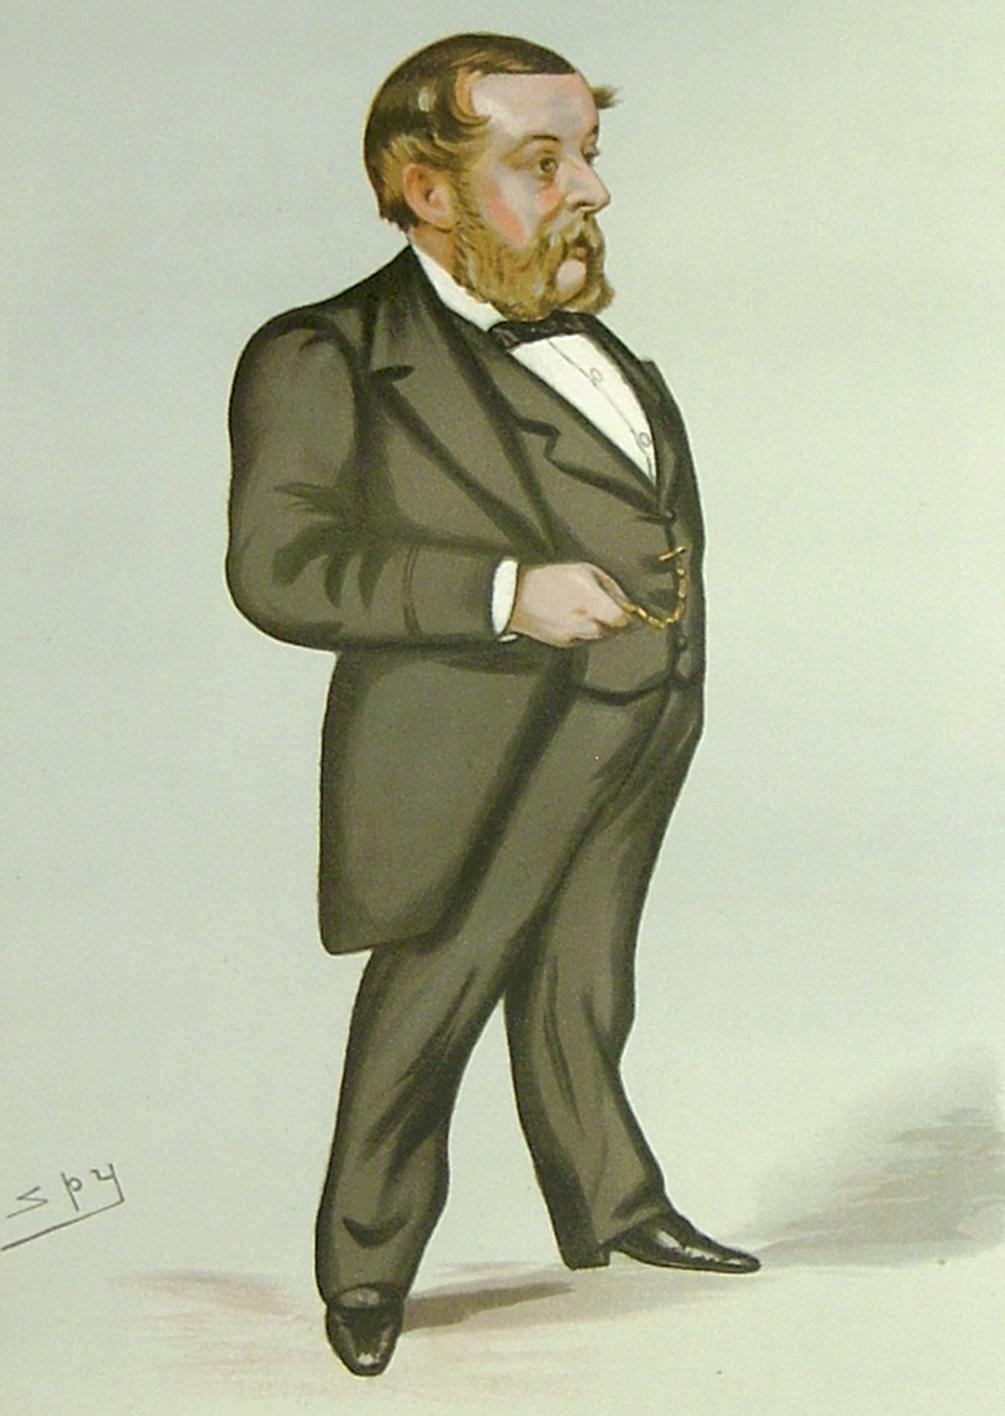 R.A. Proctor